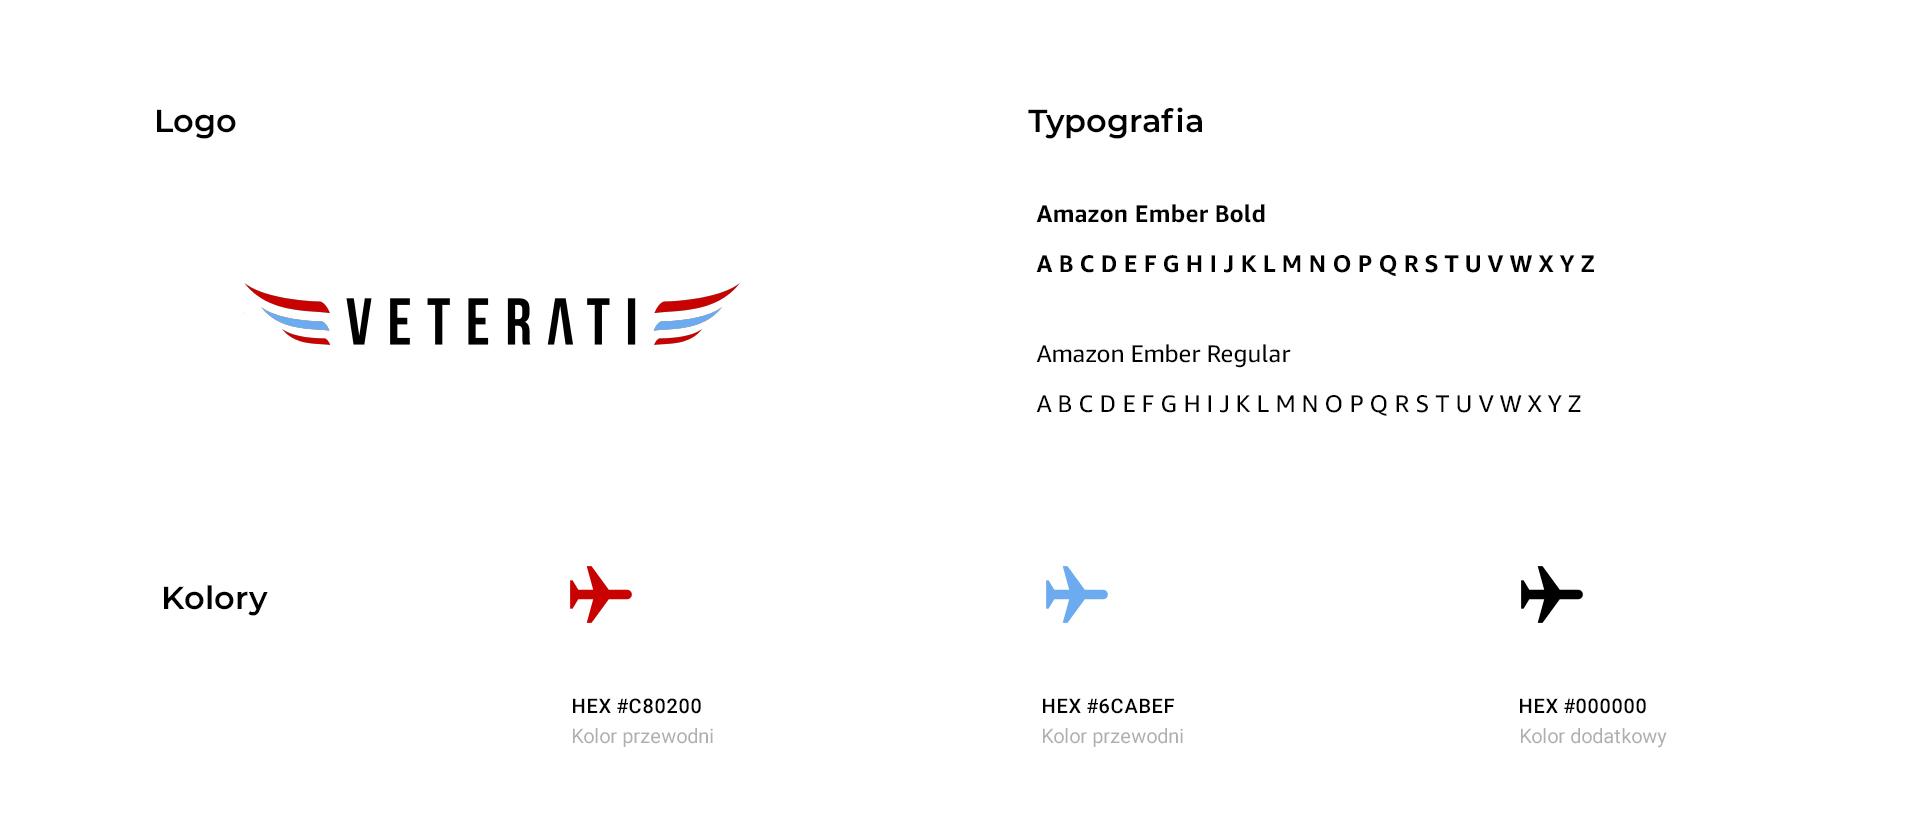 veterati-typografia-logo